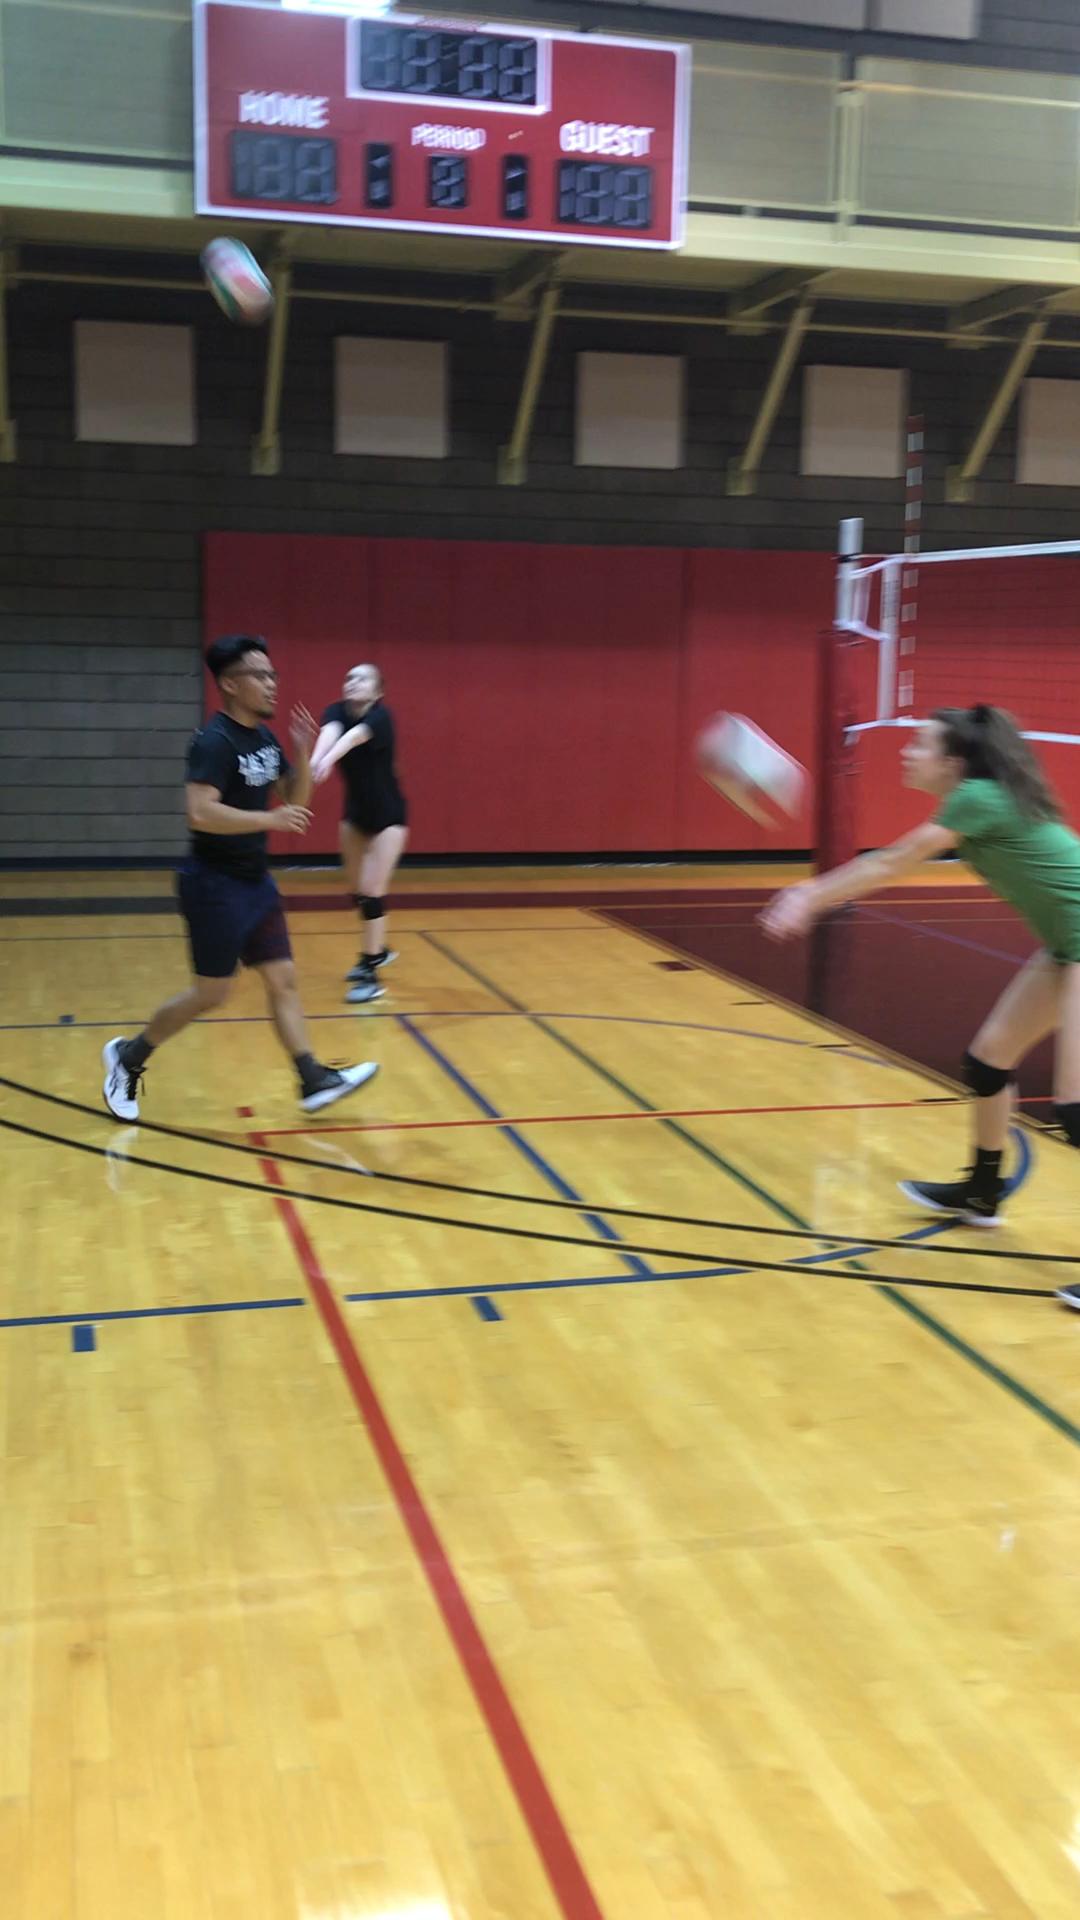 The Award Winning Las Vegas Boot Camp Volleyball Class Winter Schedule Video Video Volleyball Training Volleyball Practice Volleyball Tryouts